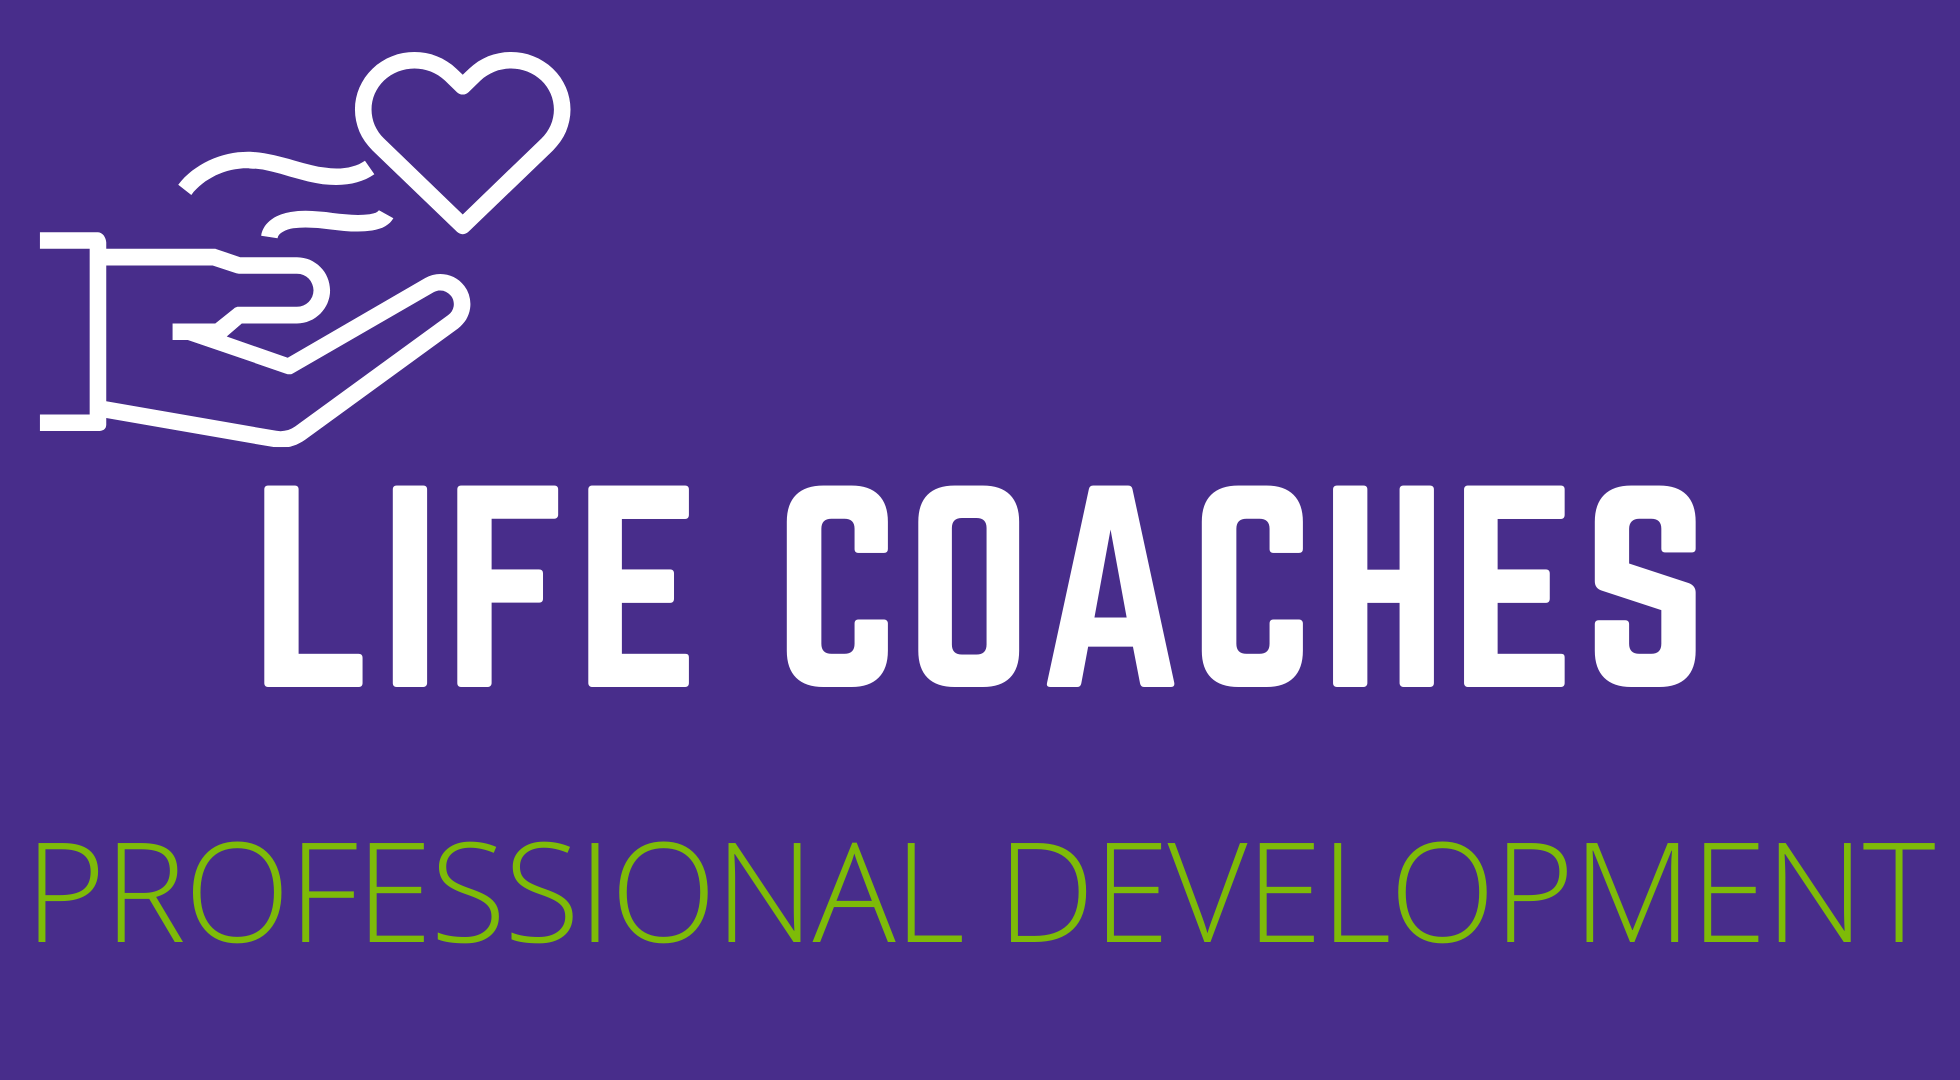 Life Coaches